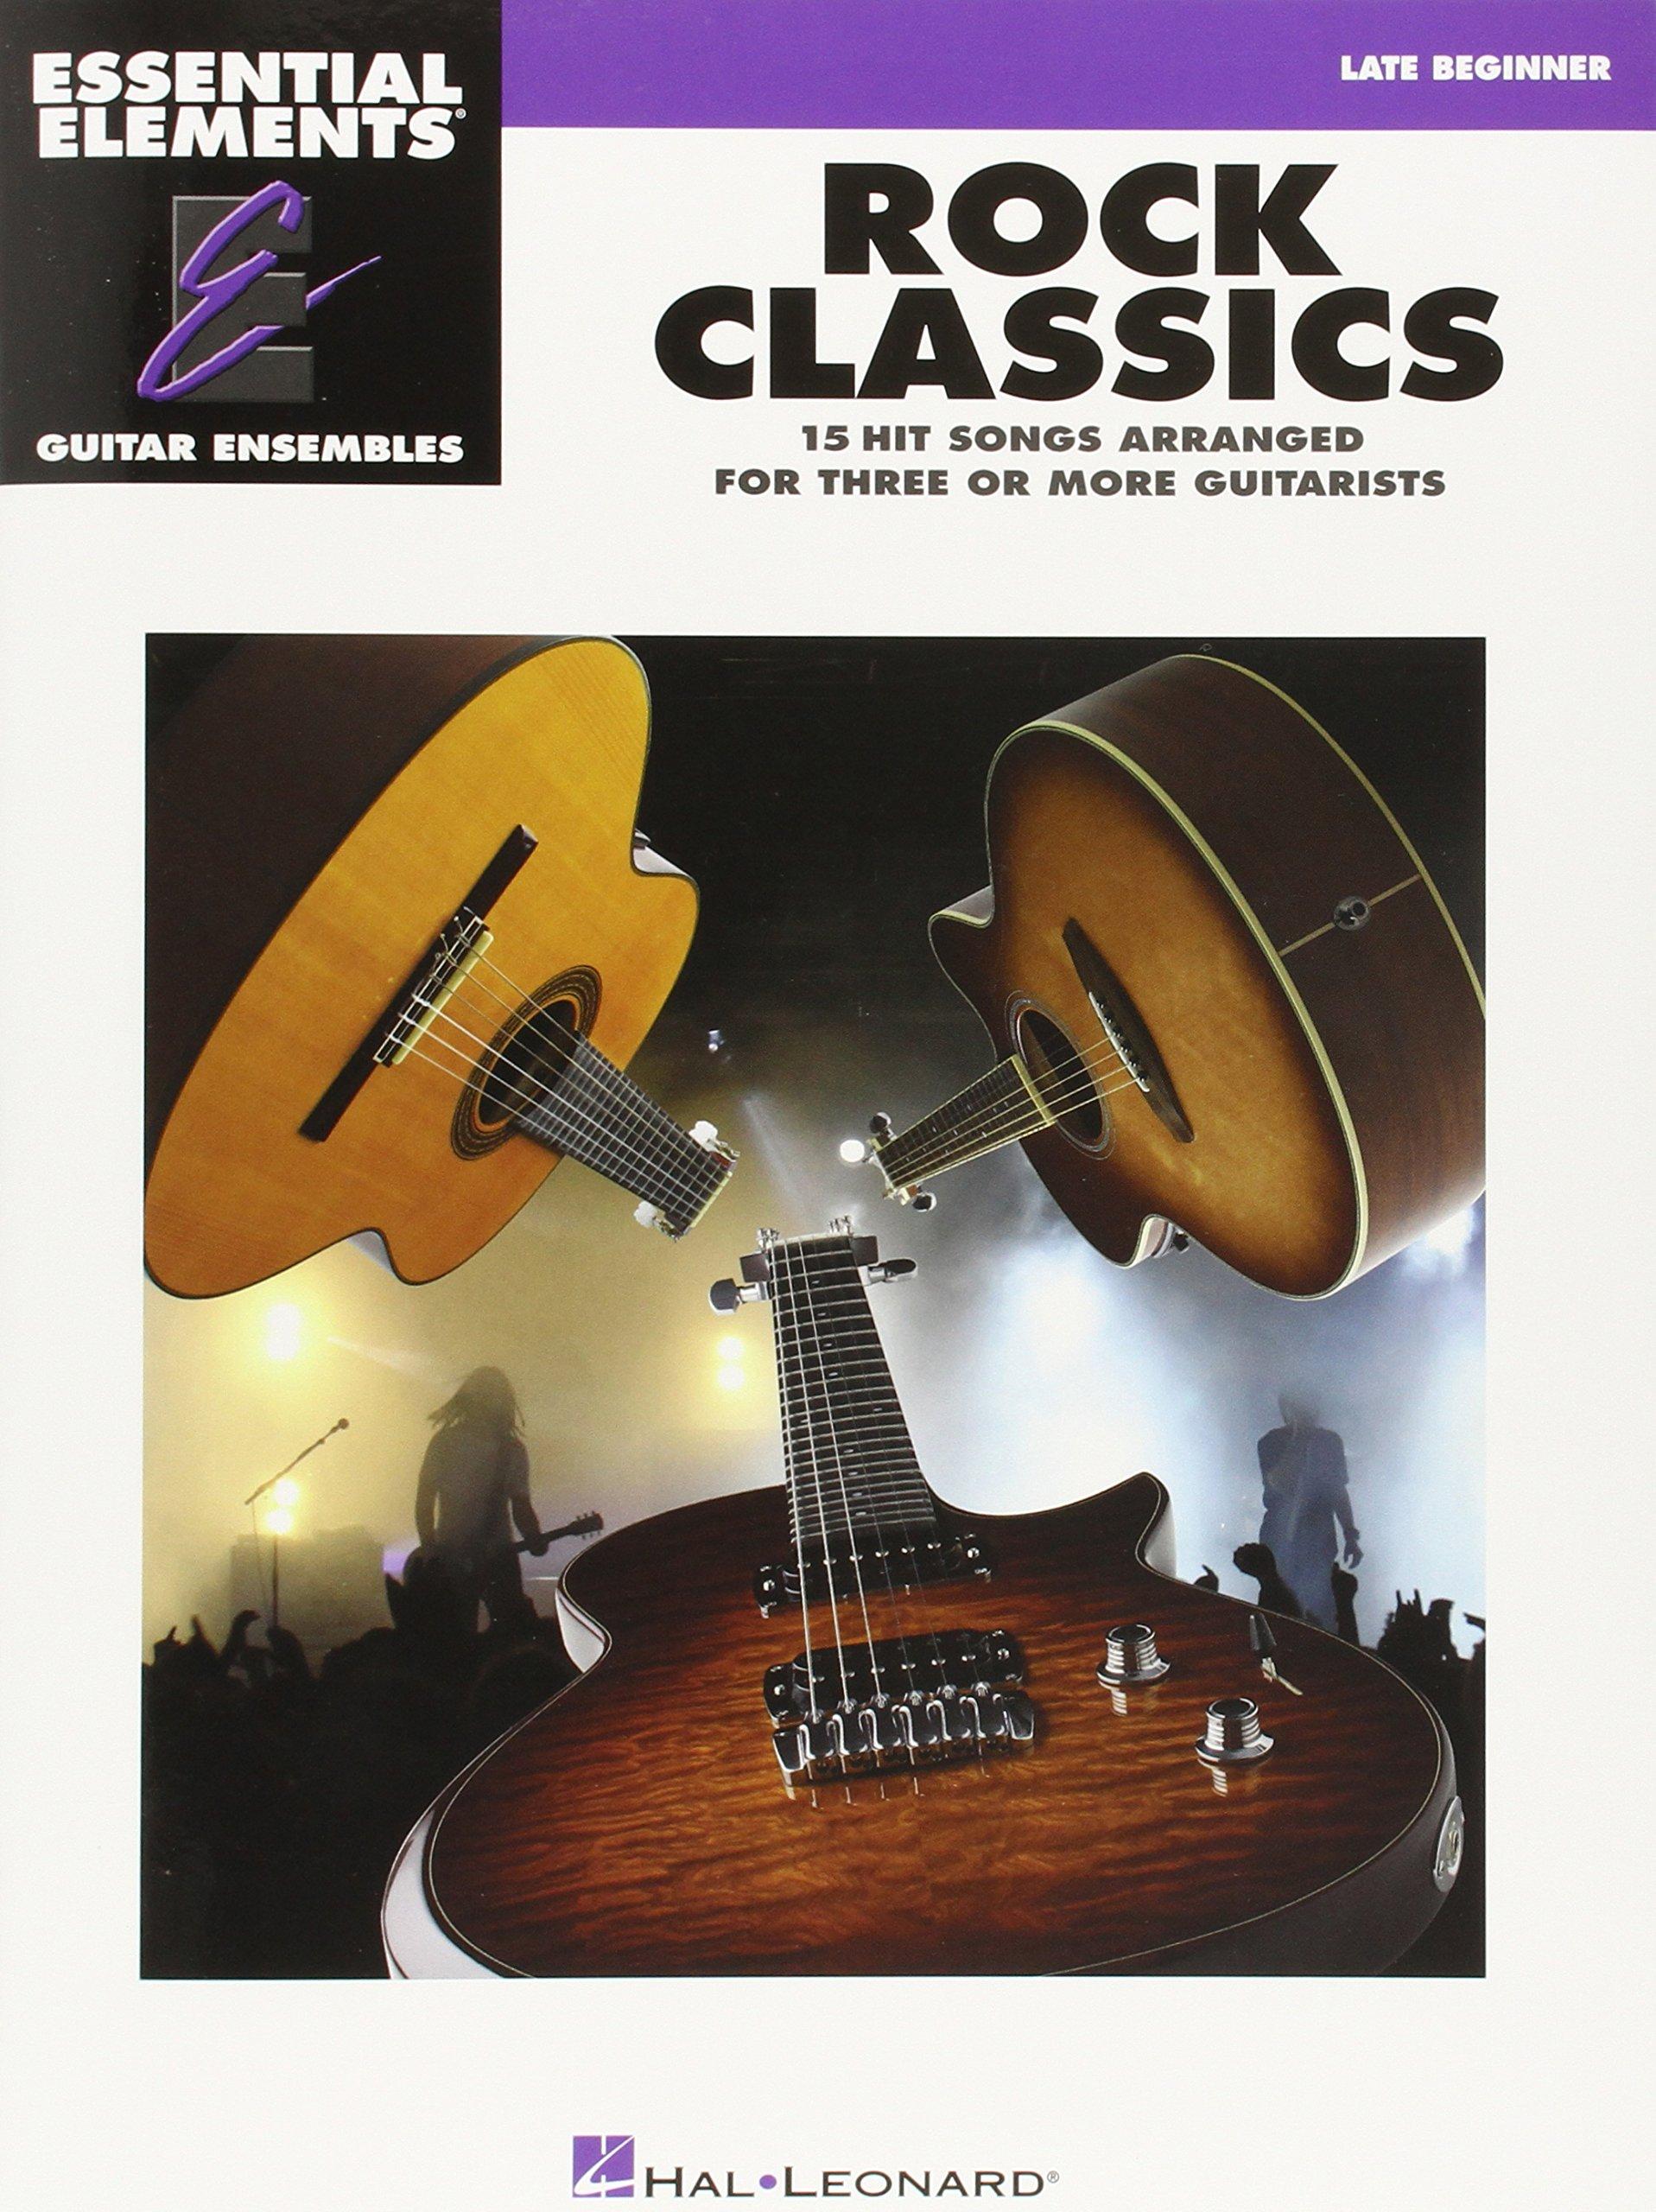 Rock Classics: Essential Elements Guitar Ensembles Late Beginner Level